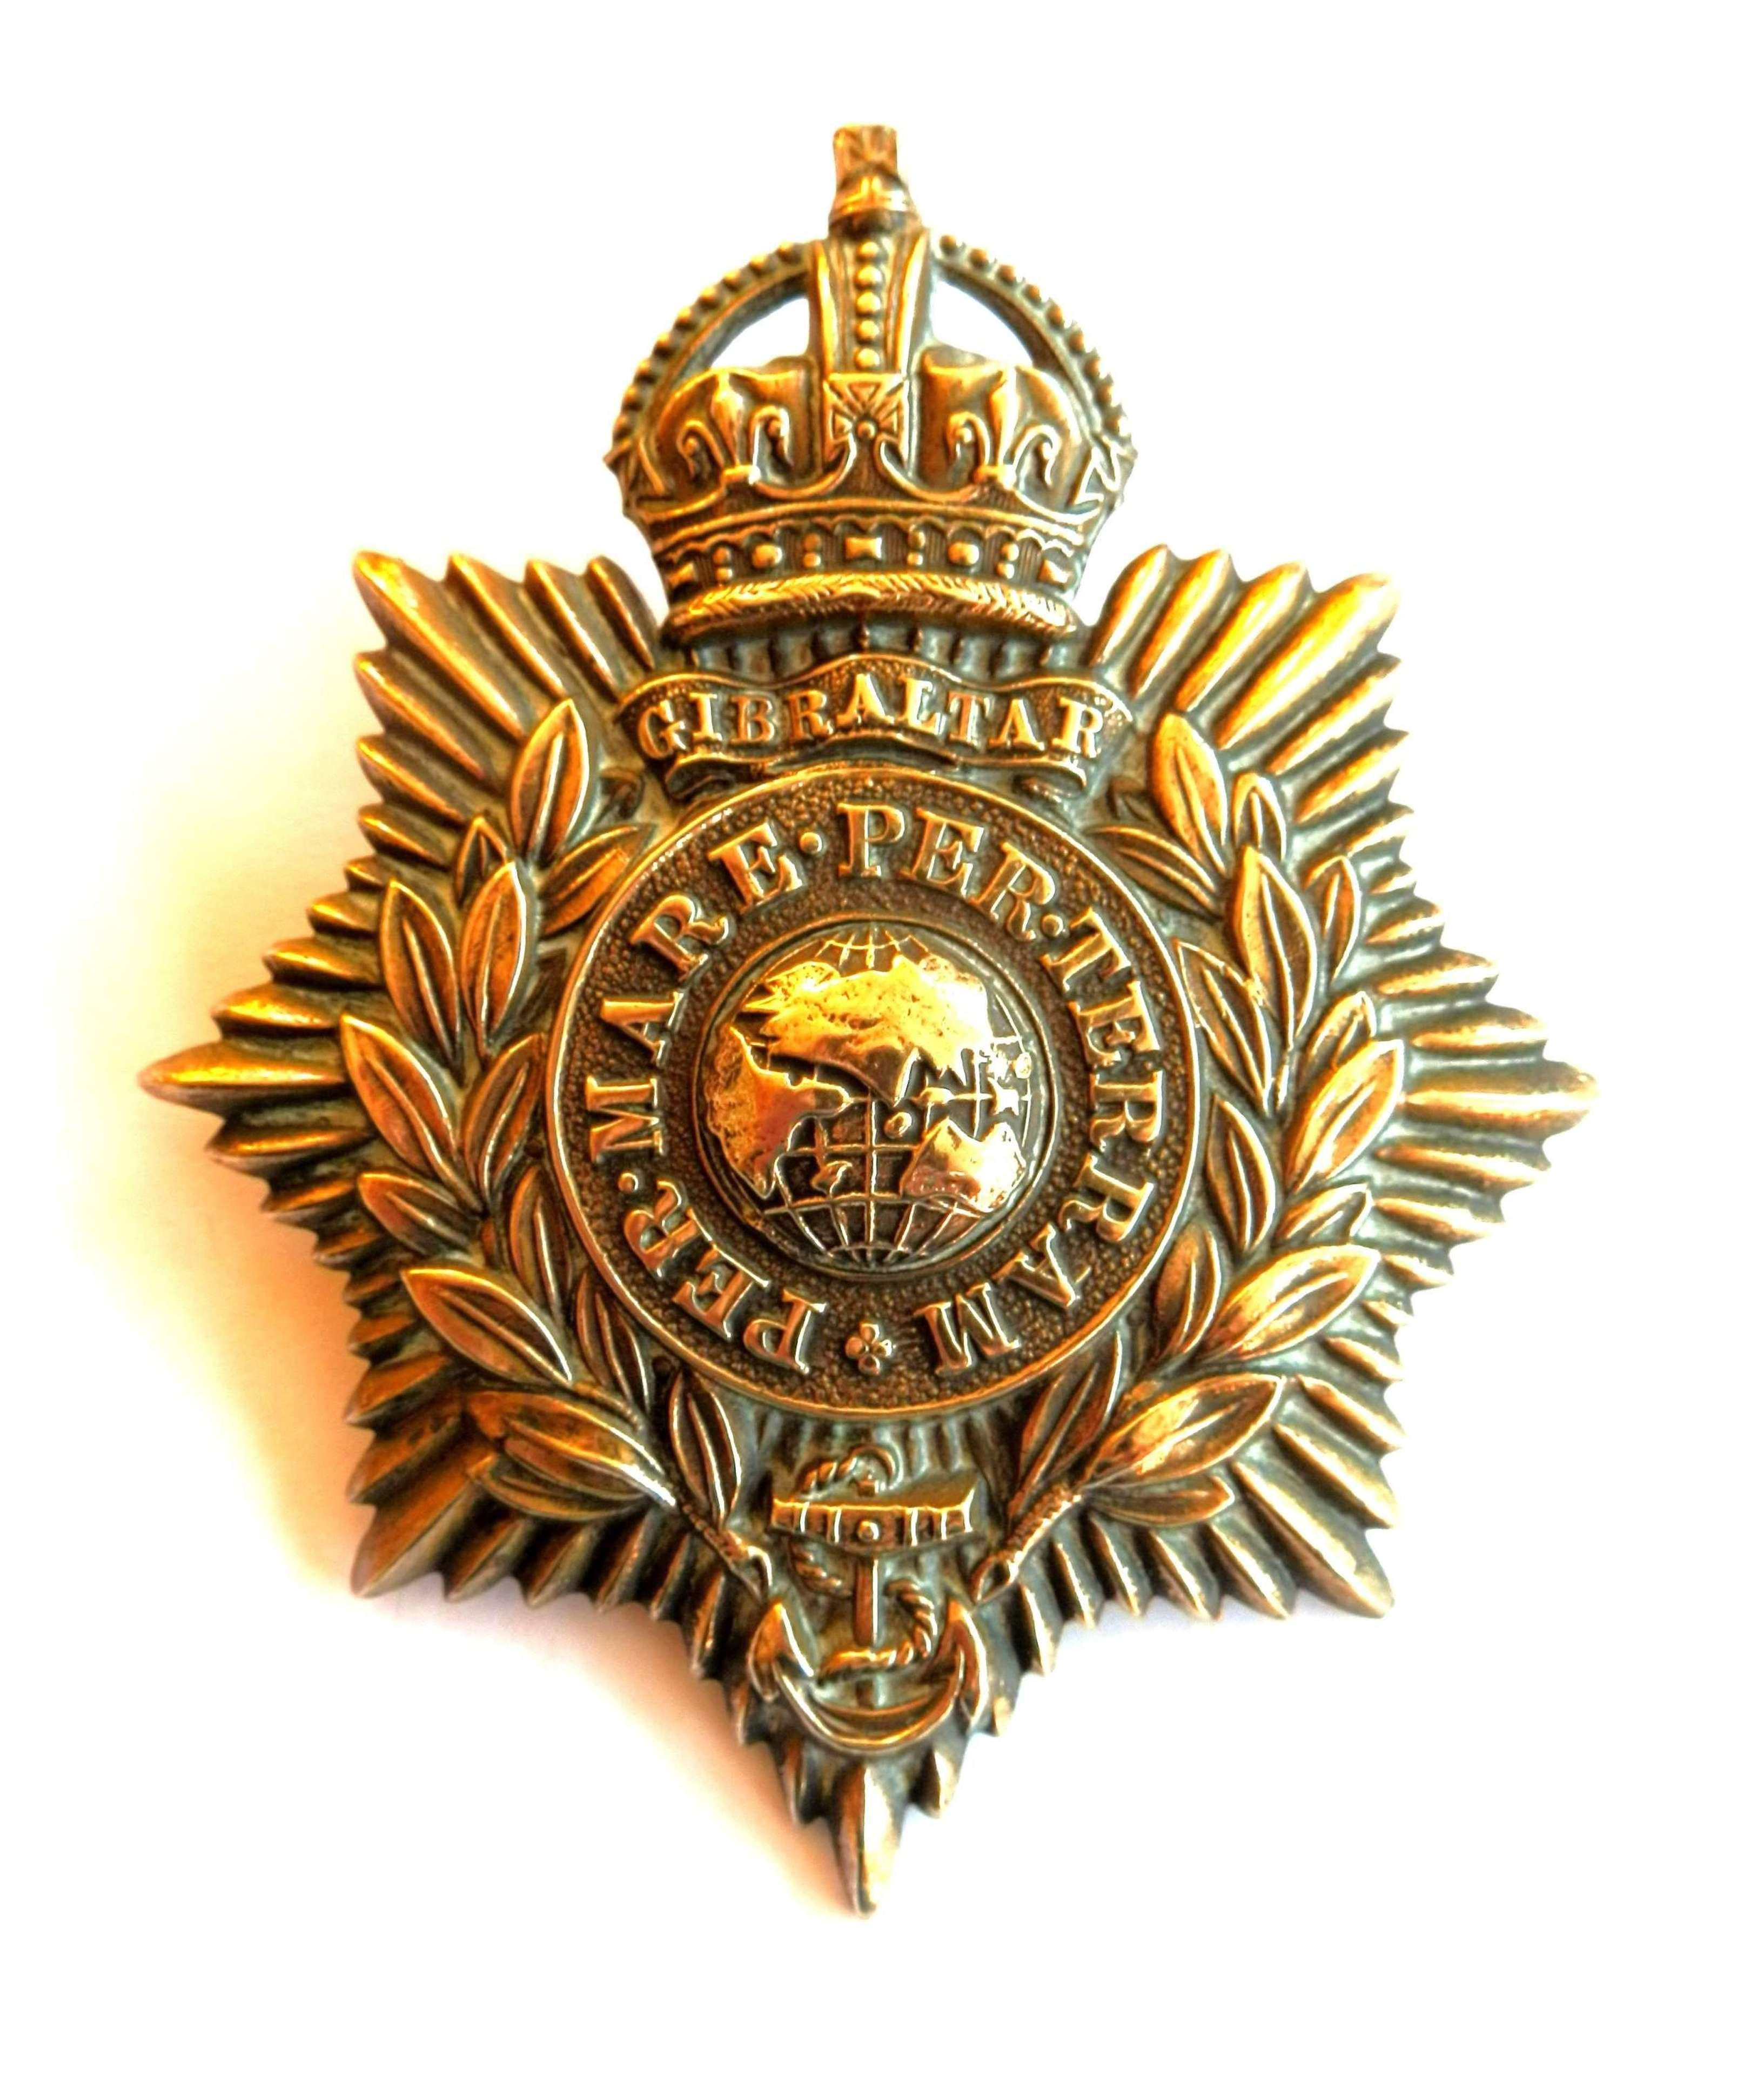 Royal Marines Helmet Plate.